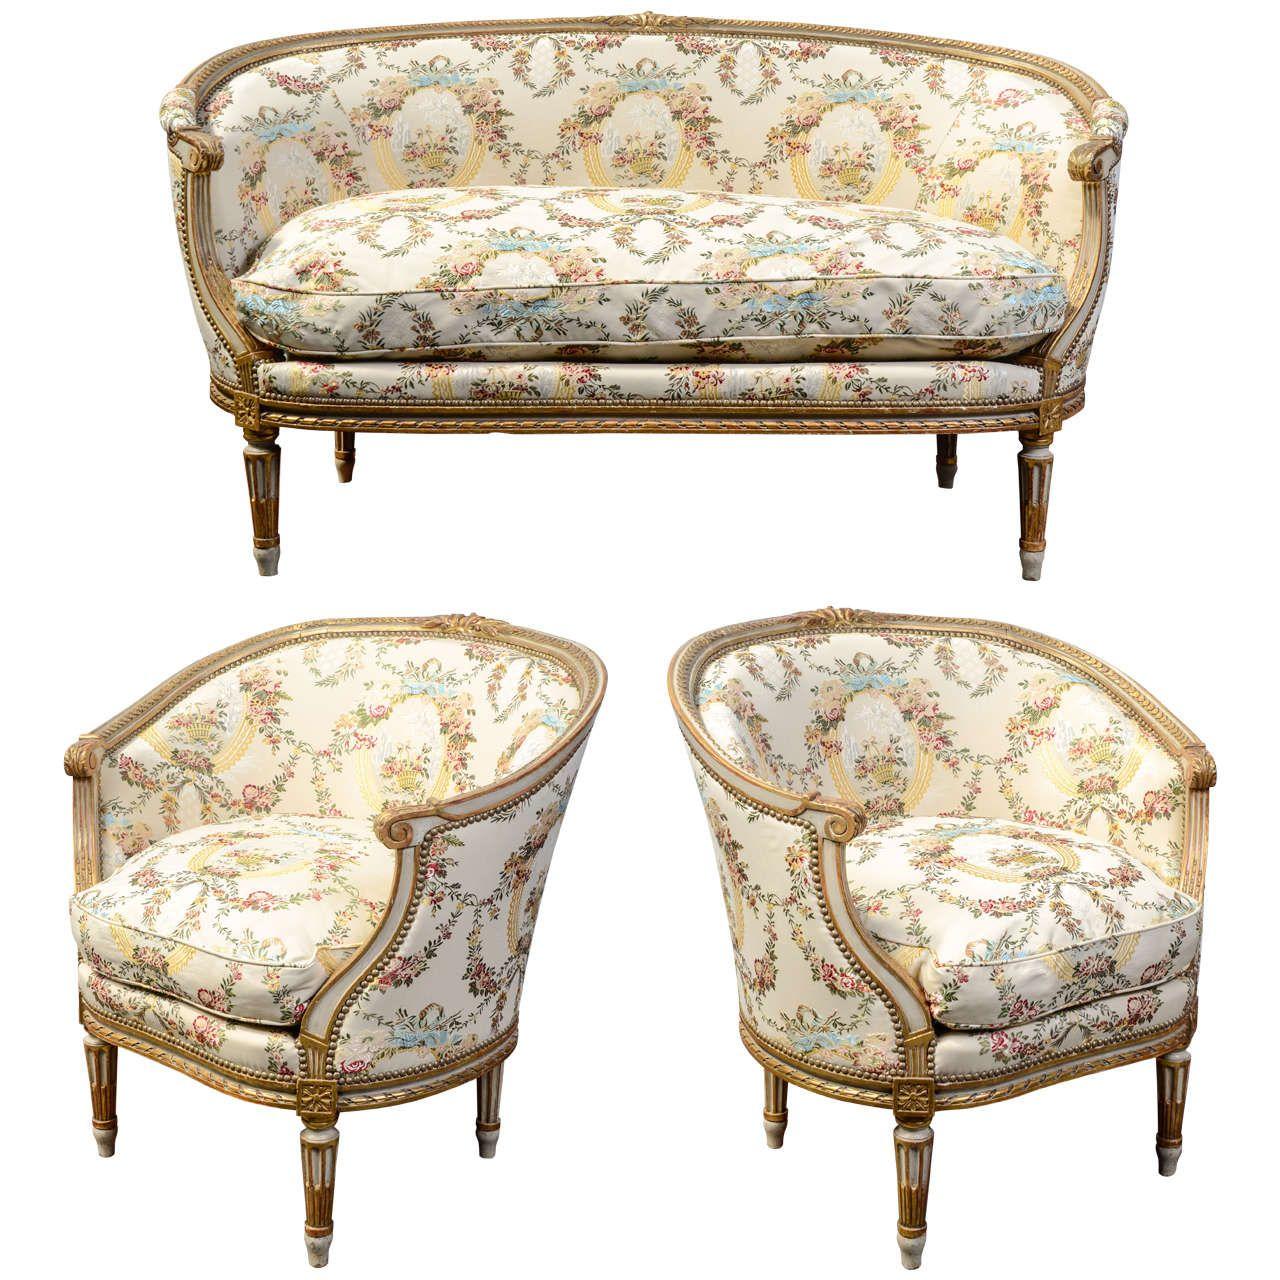 pin by guillaume op 39 s on meubles louis xvi mobilier de. Black Bedroom Furniture Sets. Home Design Ideas